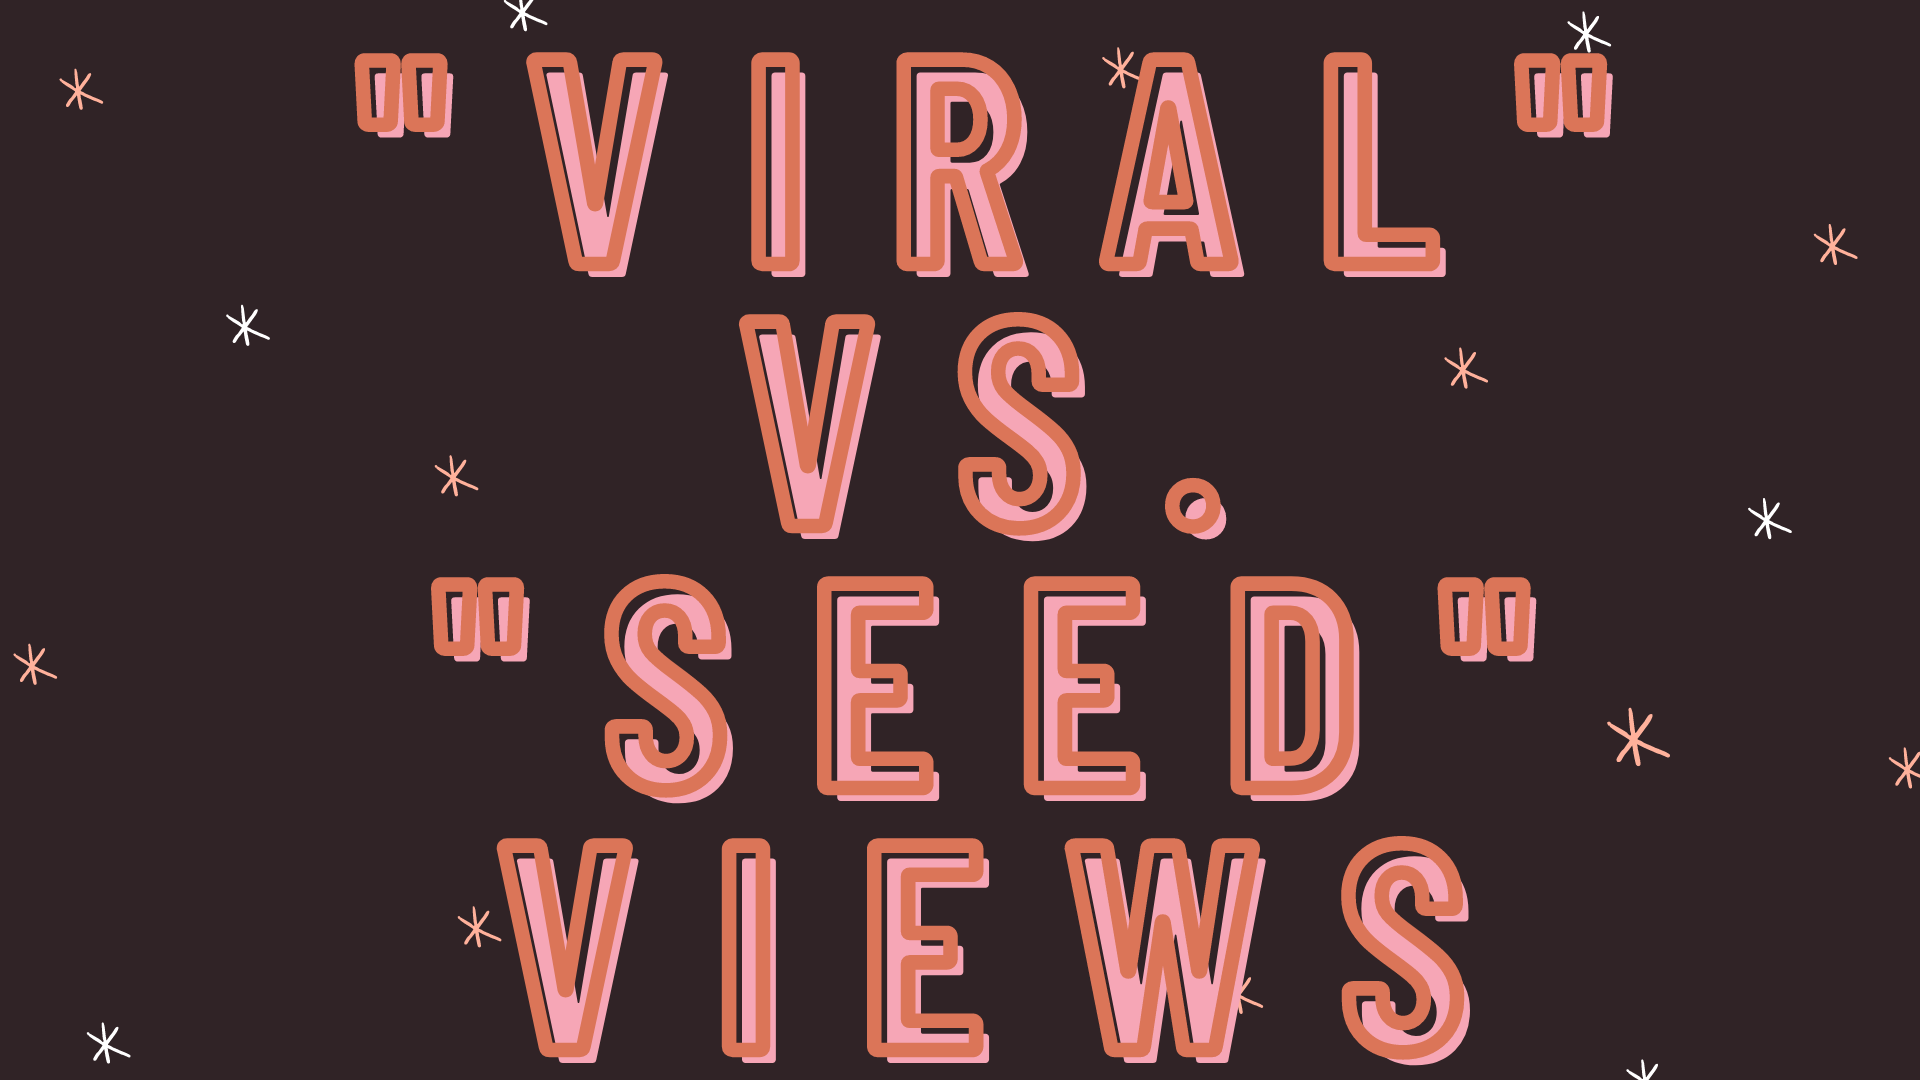 viral vs seed views